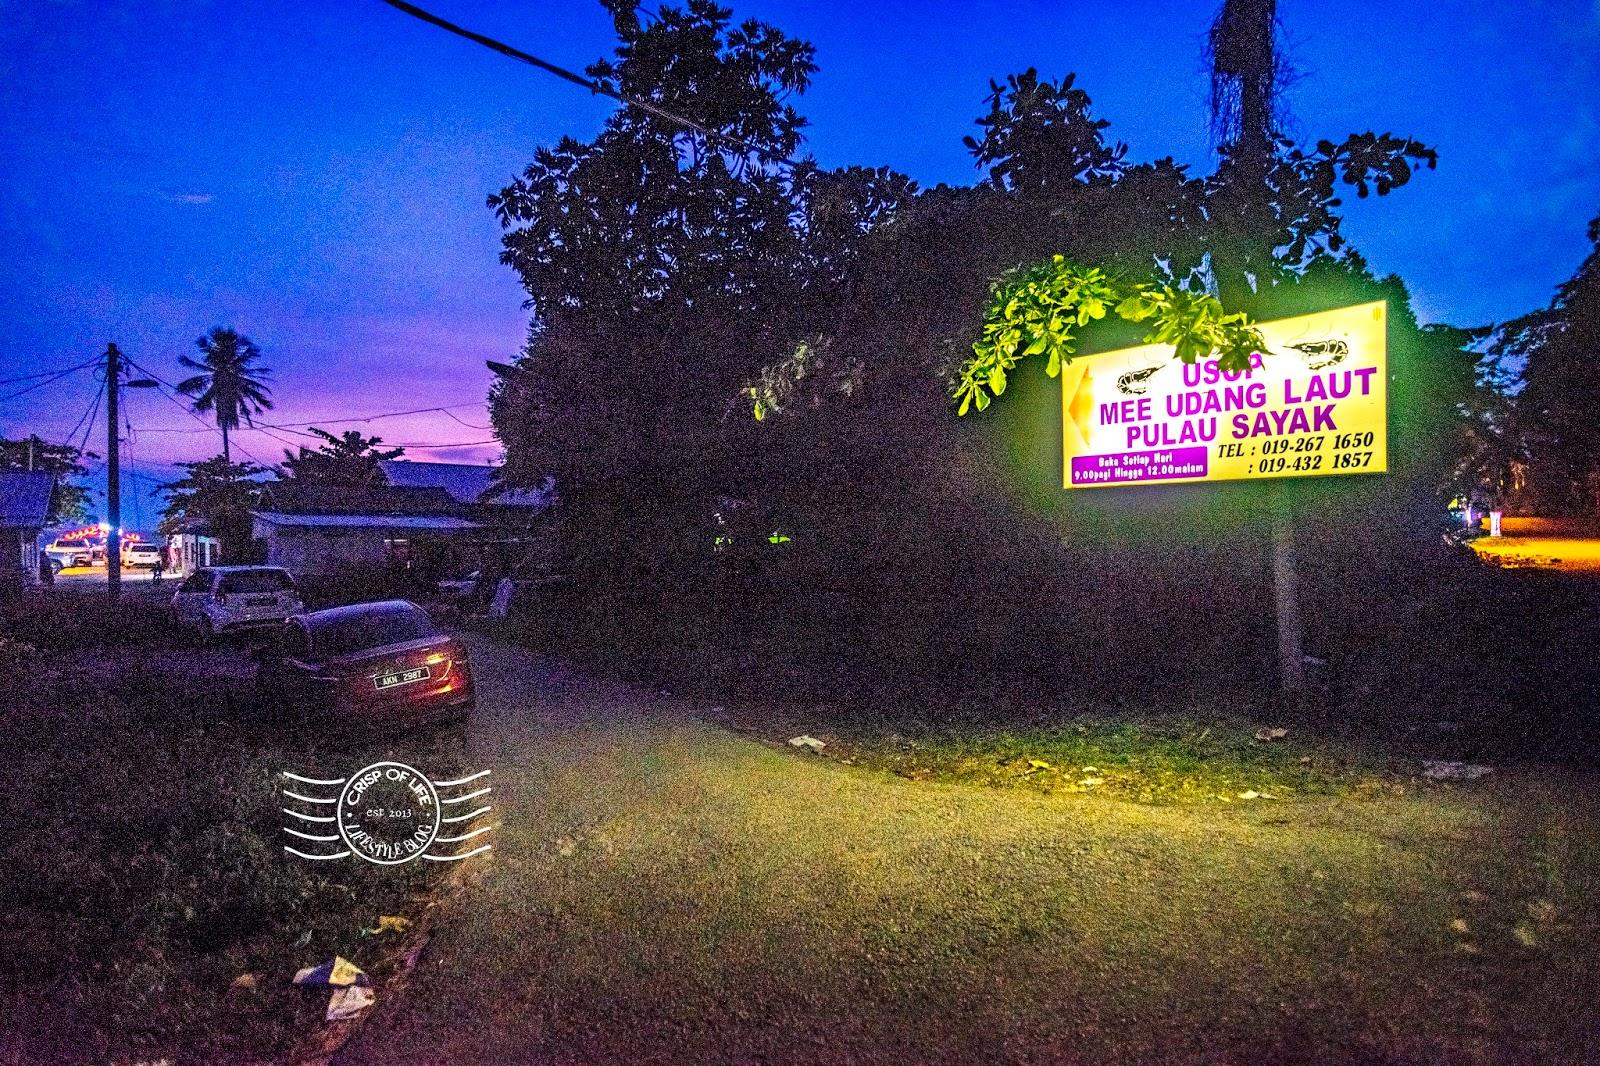 Mee Udang Usop @ Pulau Sayak, Kota Kuala Muda, Kedah